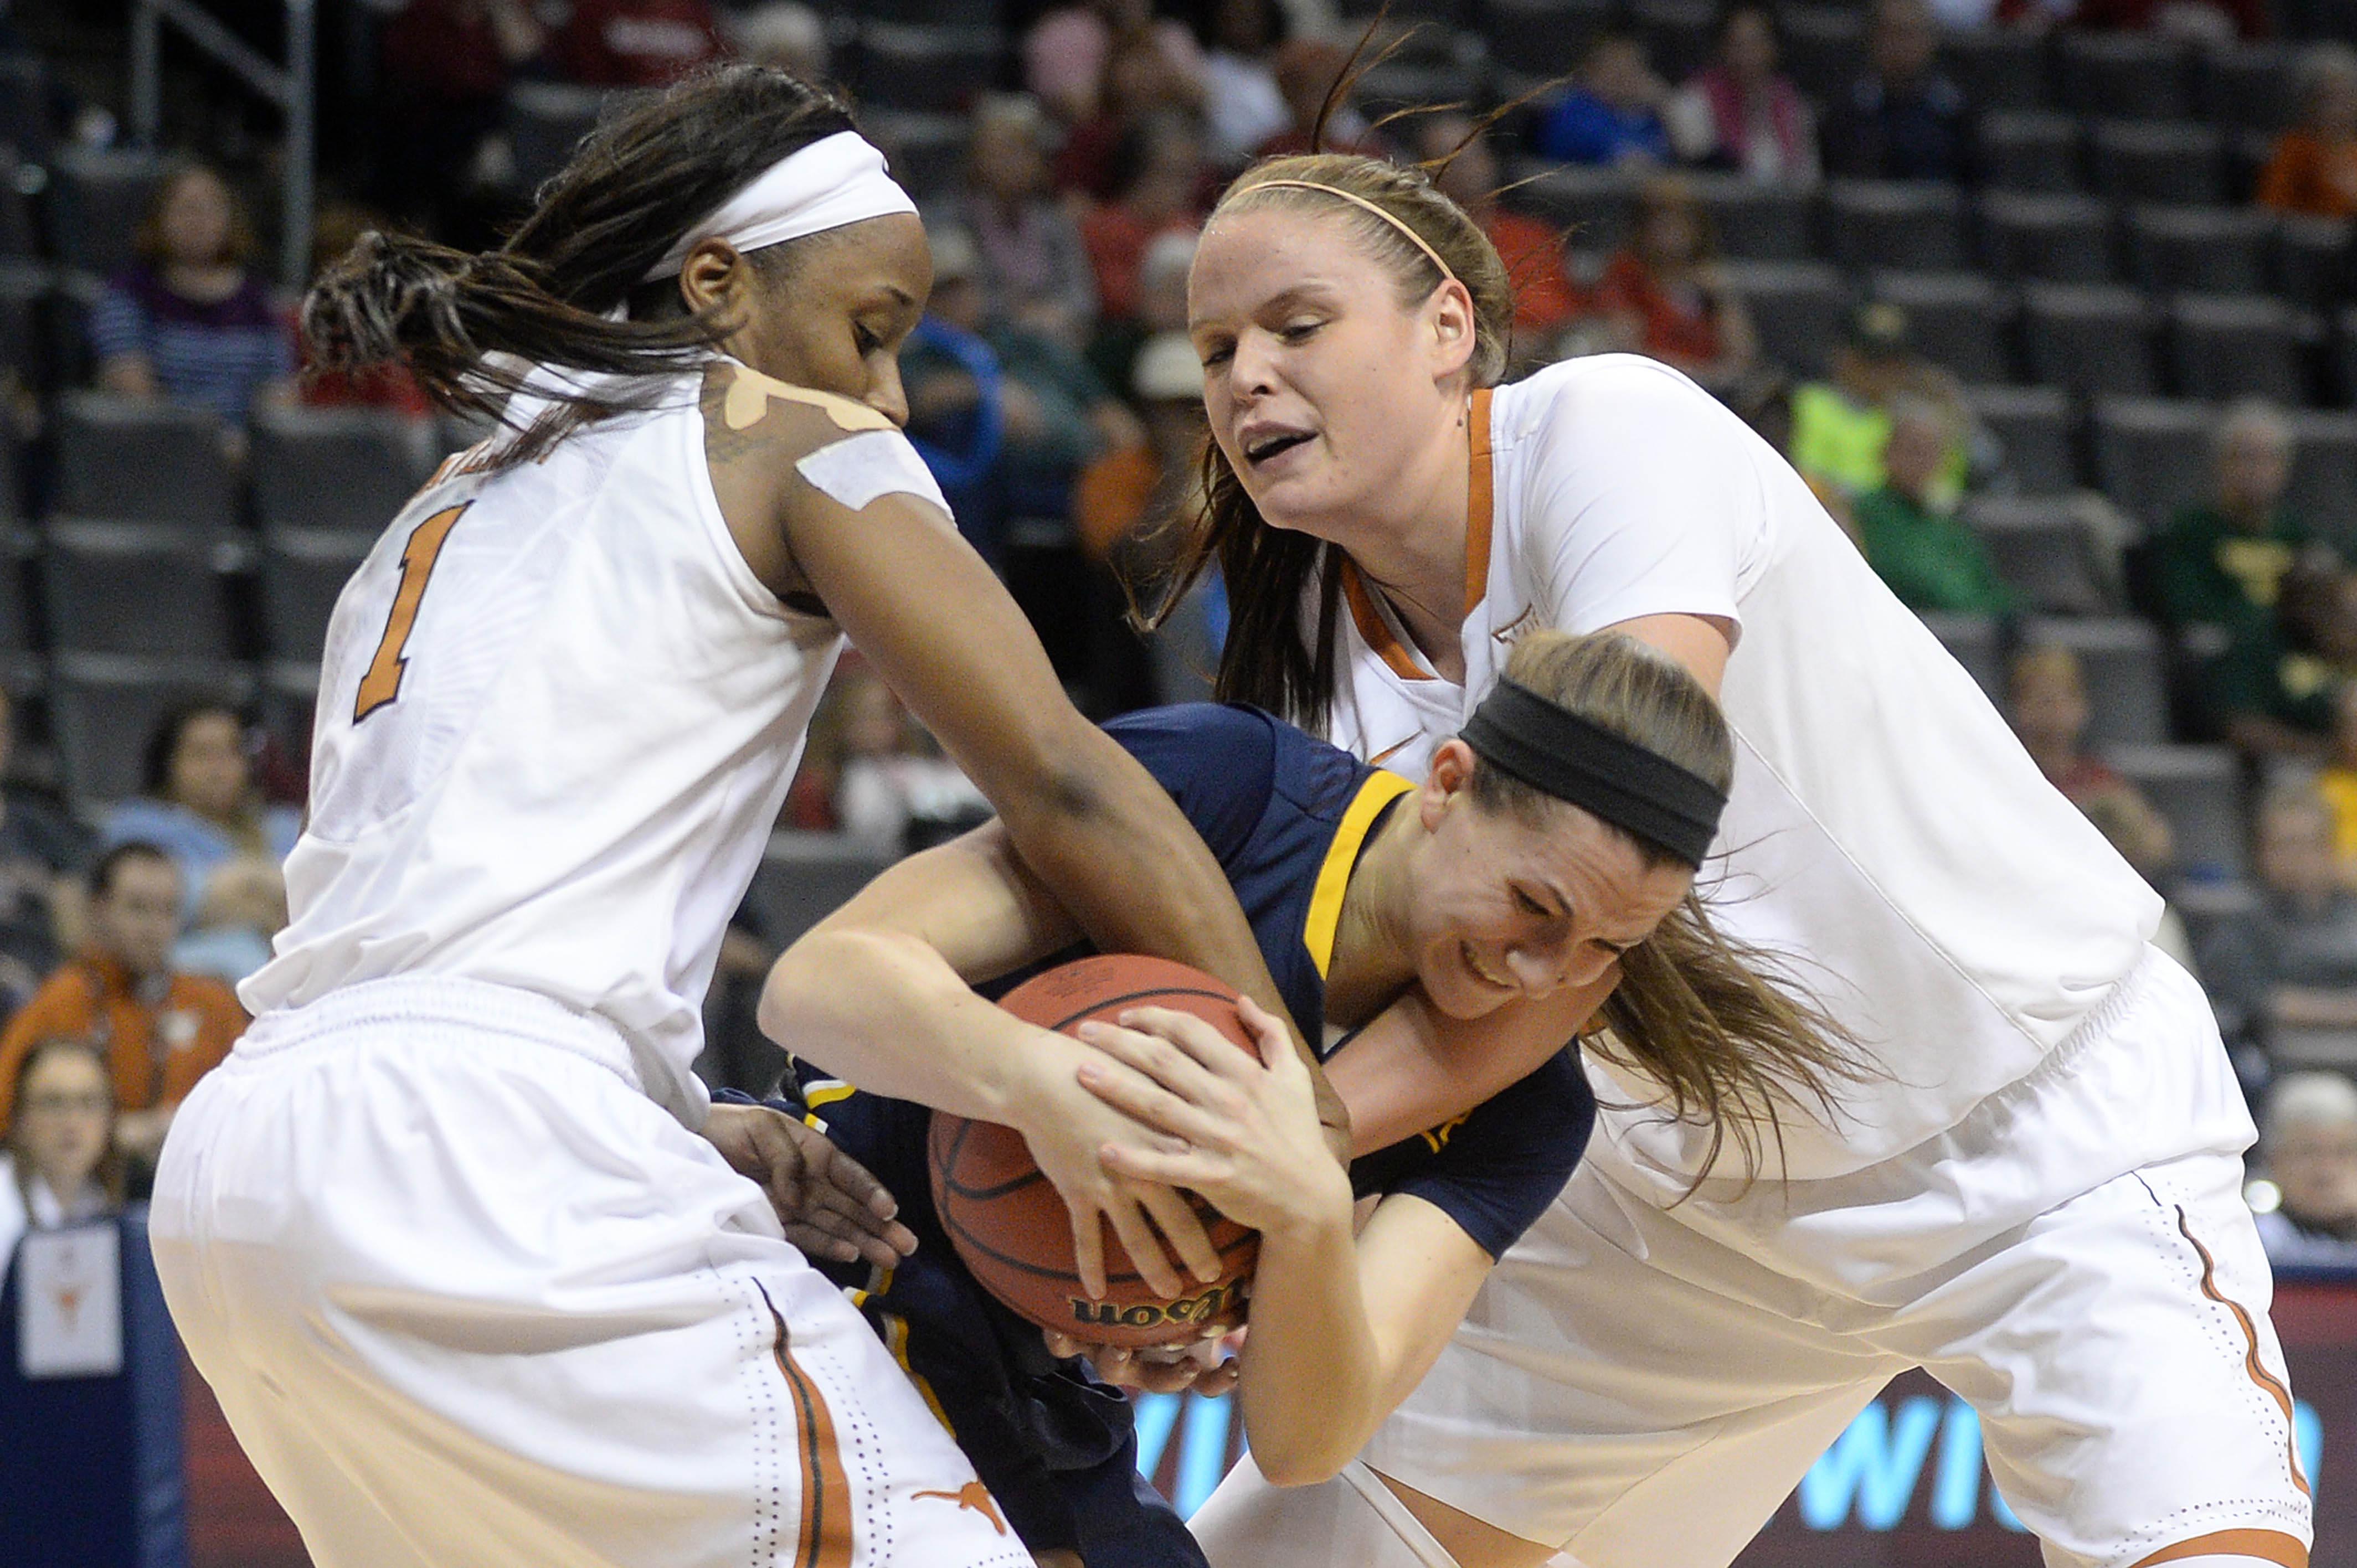 9162905-ncaa-womens-basketball-big-12-conference-tournament-texas-vs-west-virginia